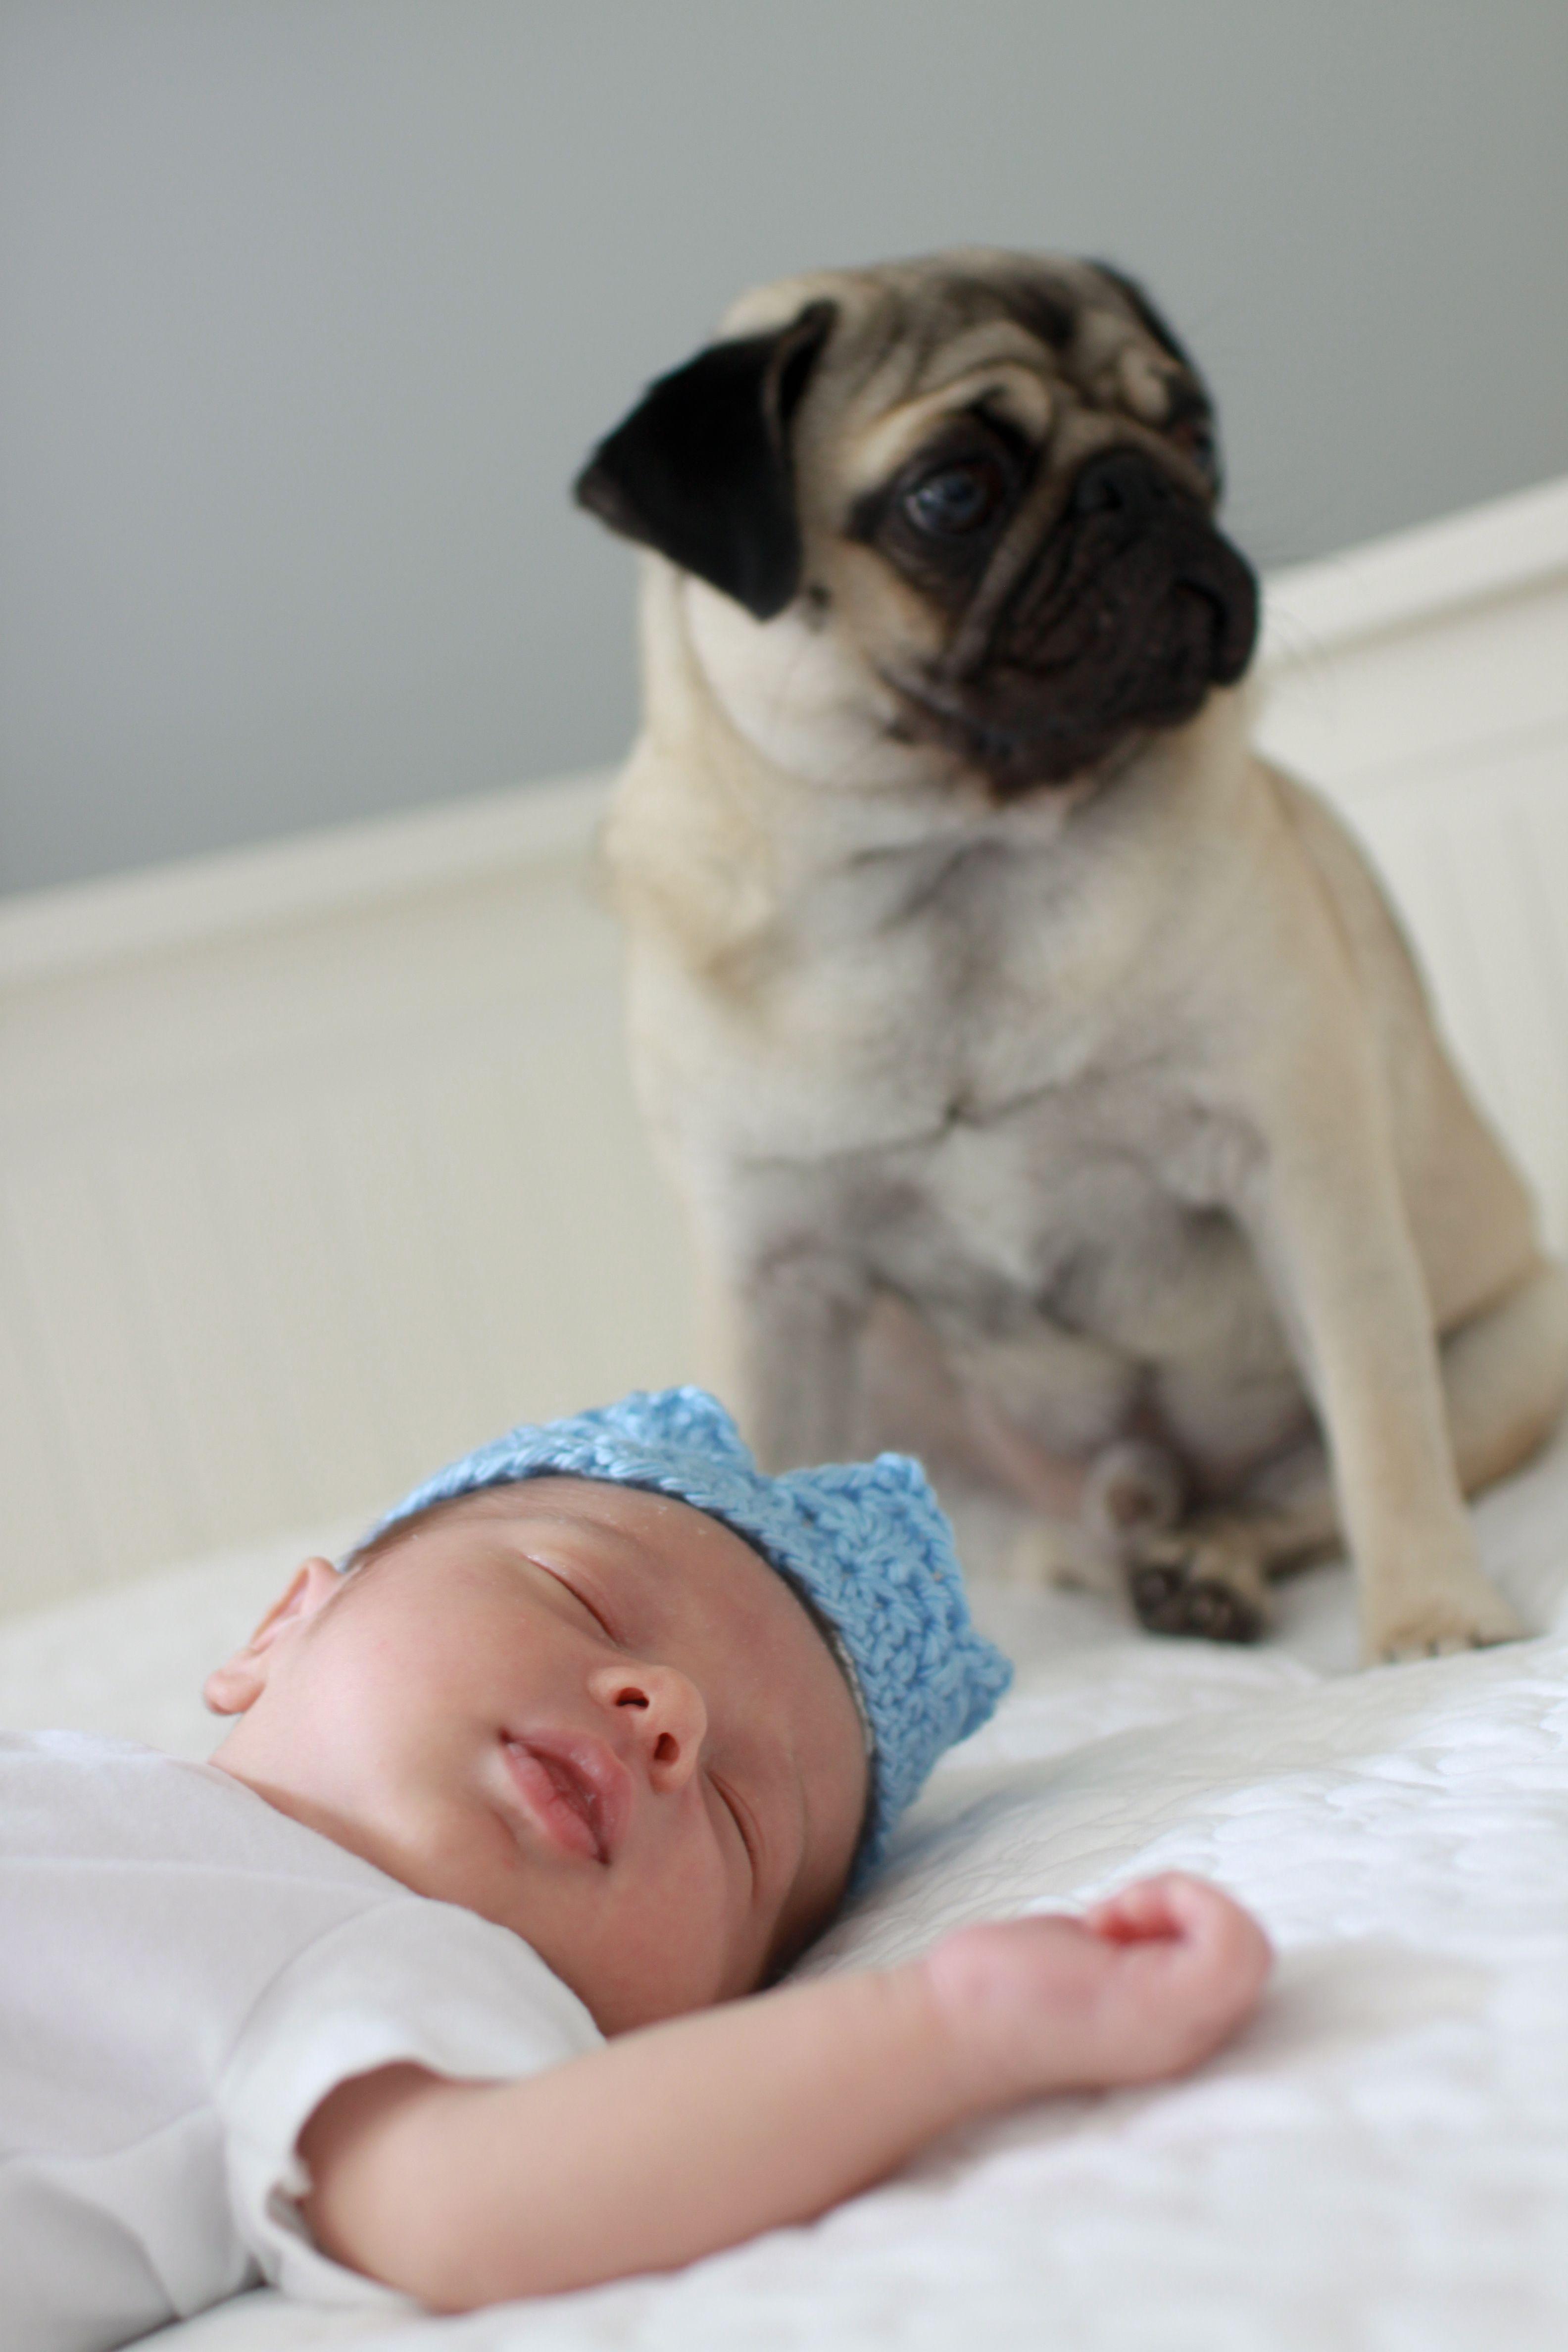 Newborn Baby Portraits Pug Puppy Dog New York City Manhattan